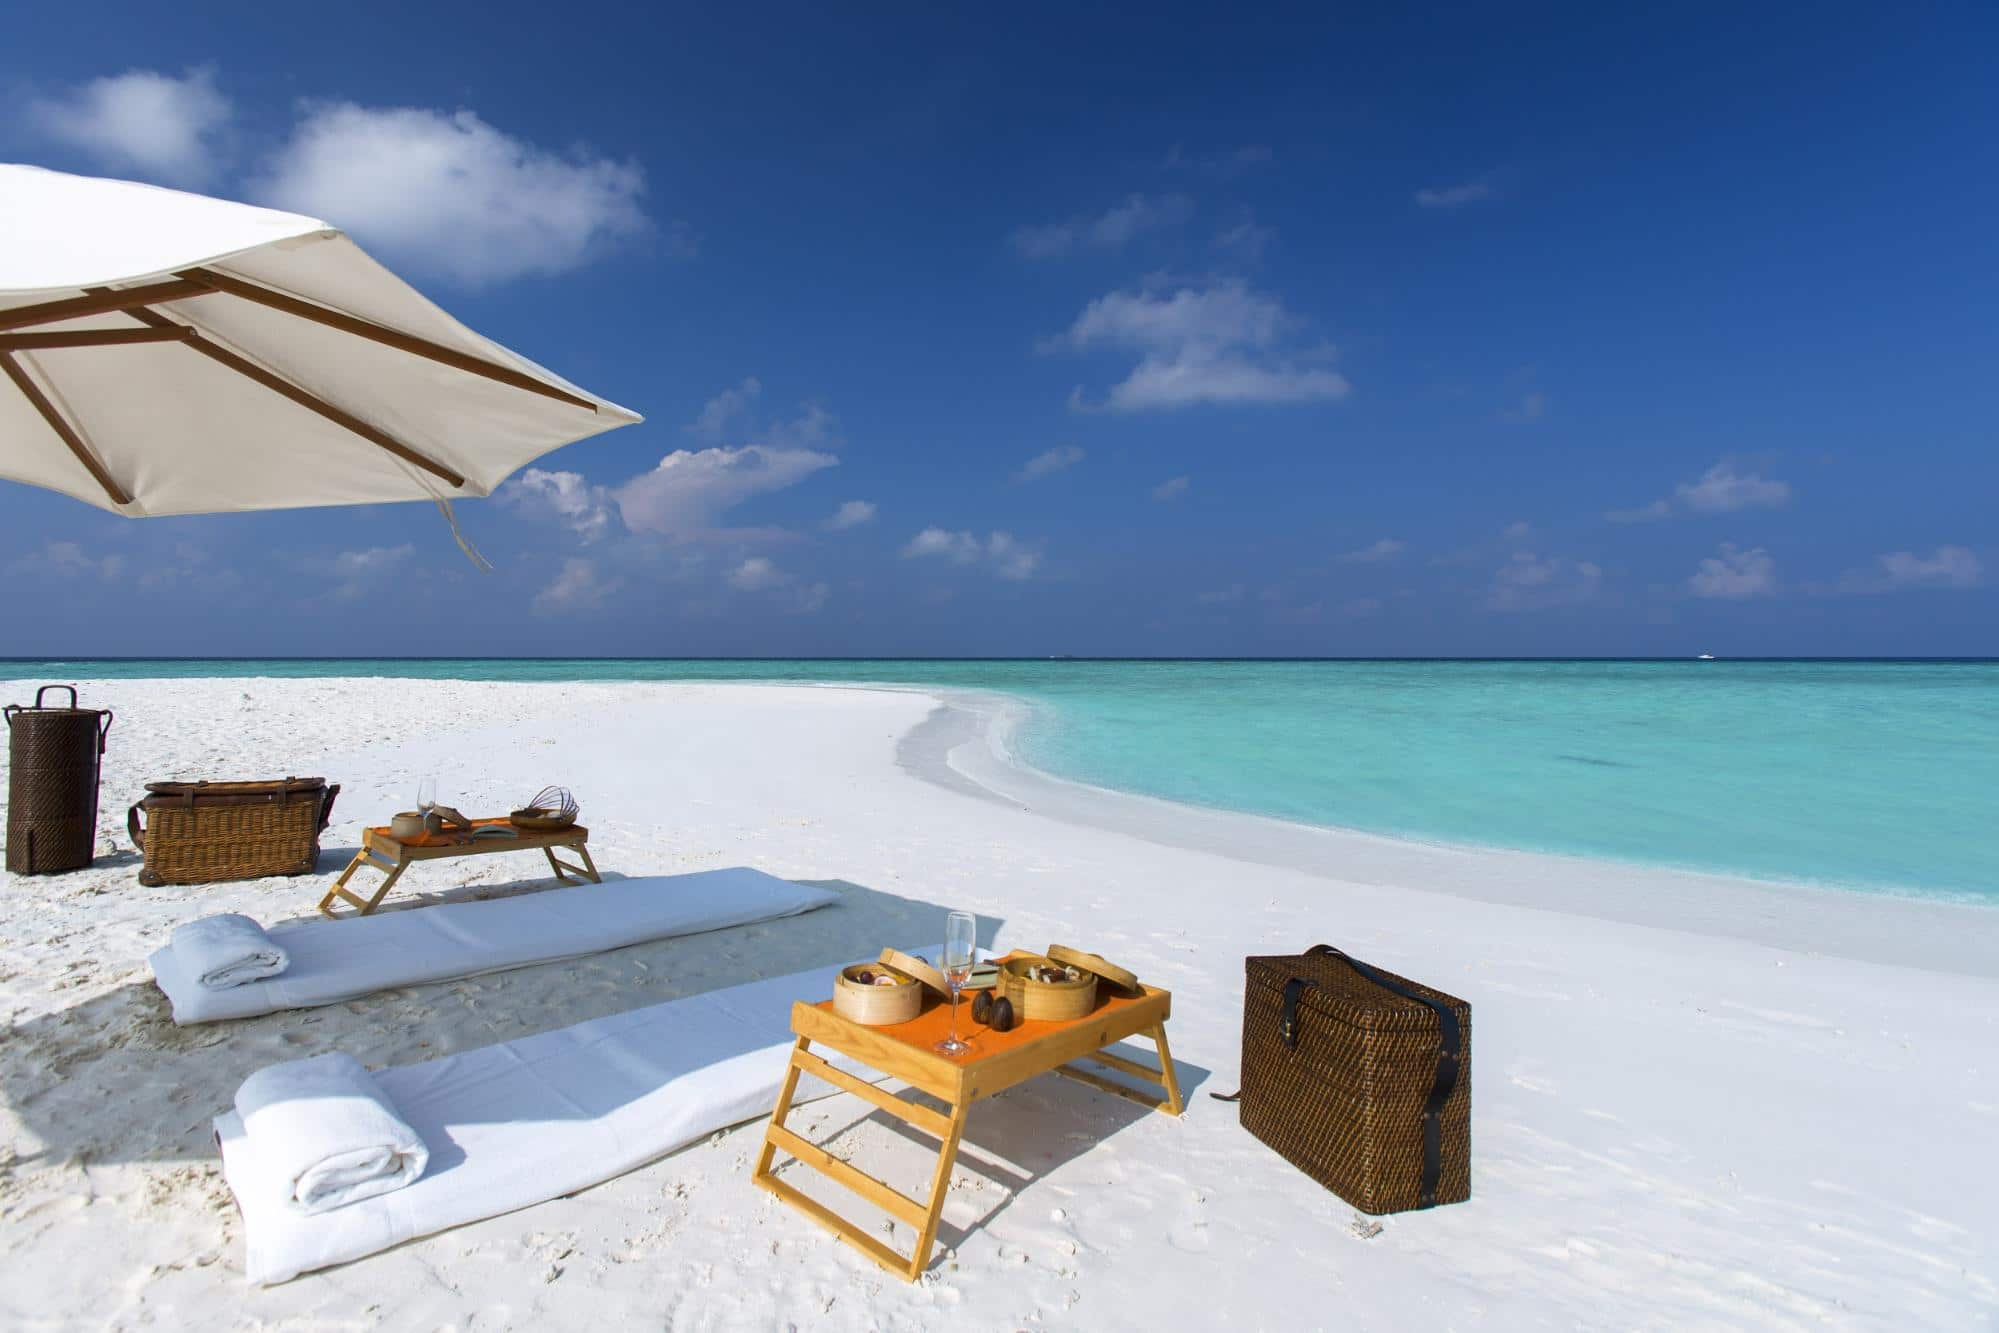 Picnic on a sandbank - Courtesy of Gili Lankanfushi